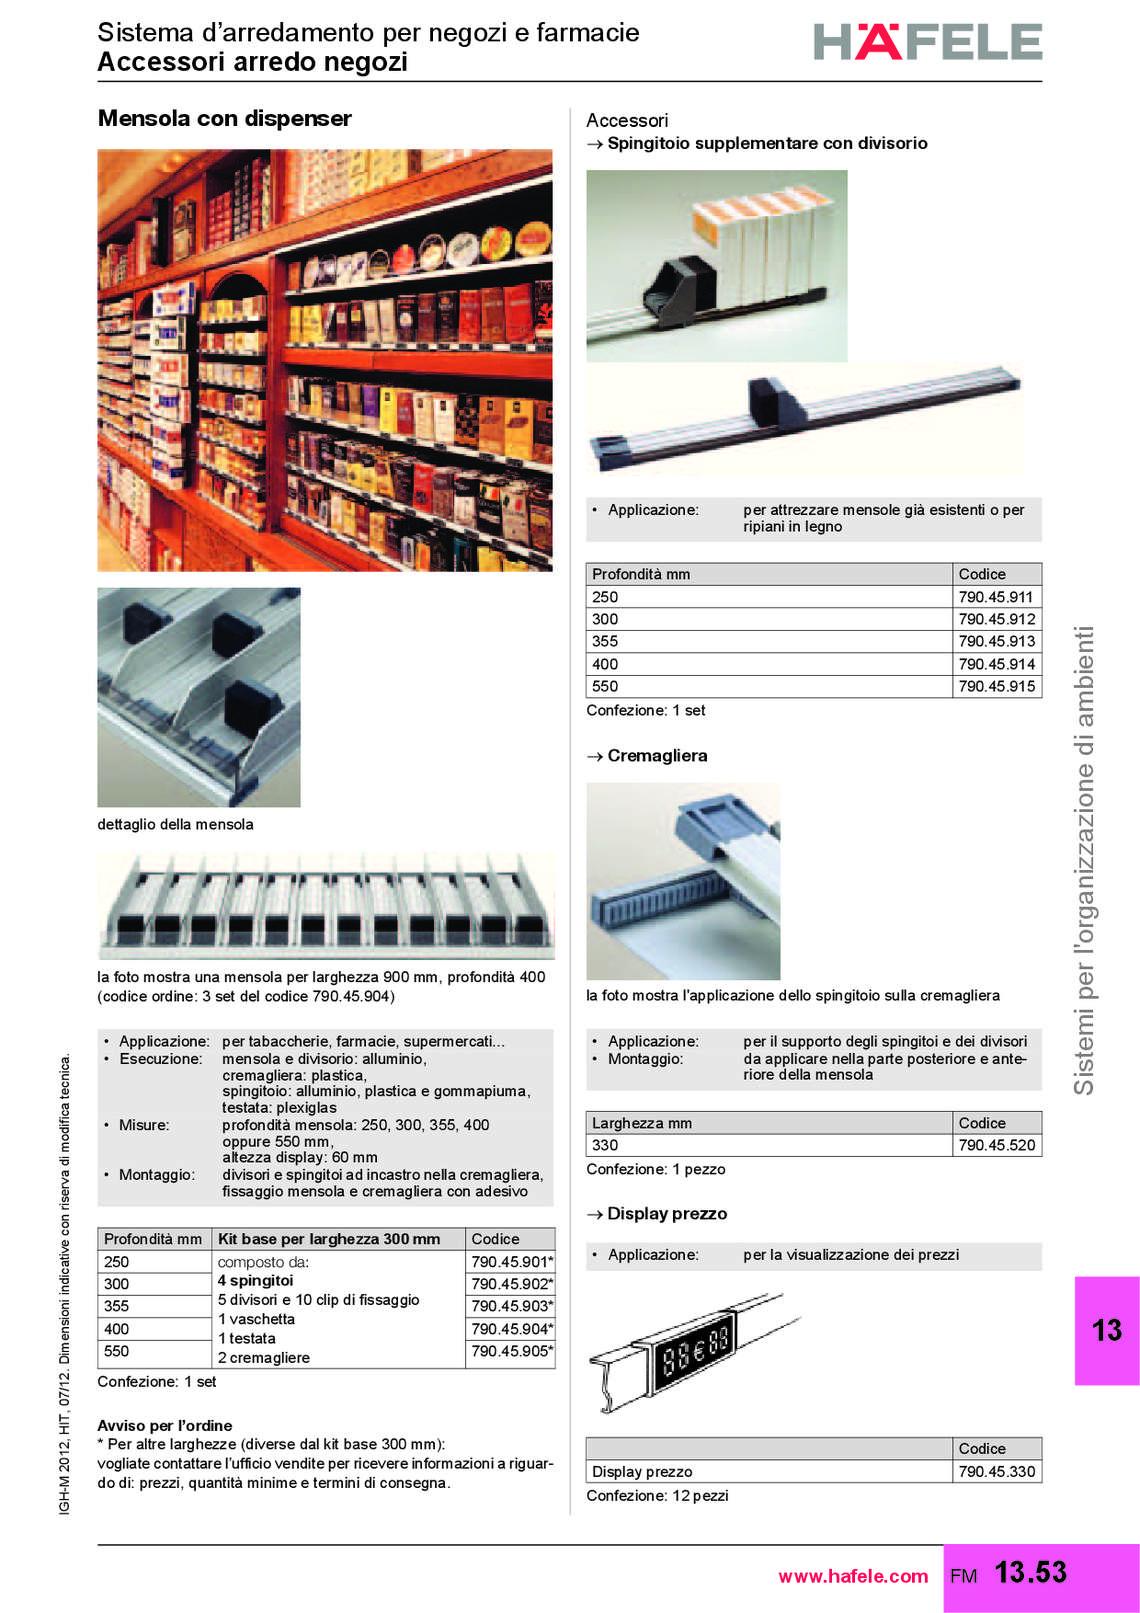 hafele-arredo-negozi-e-farmacie_32_064.jpg